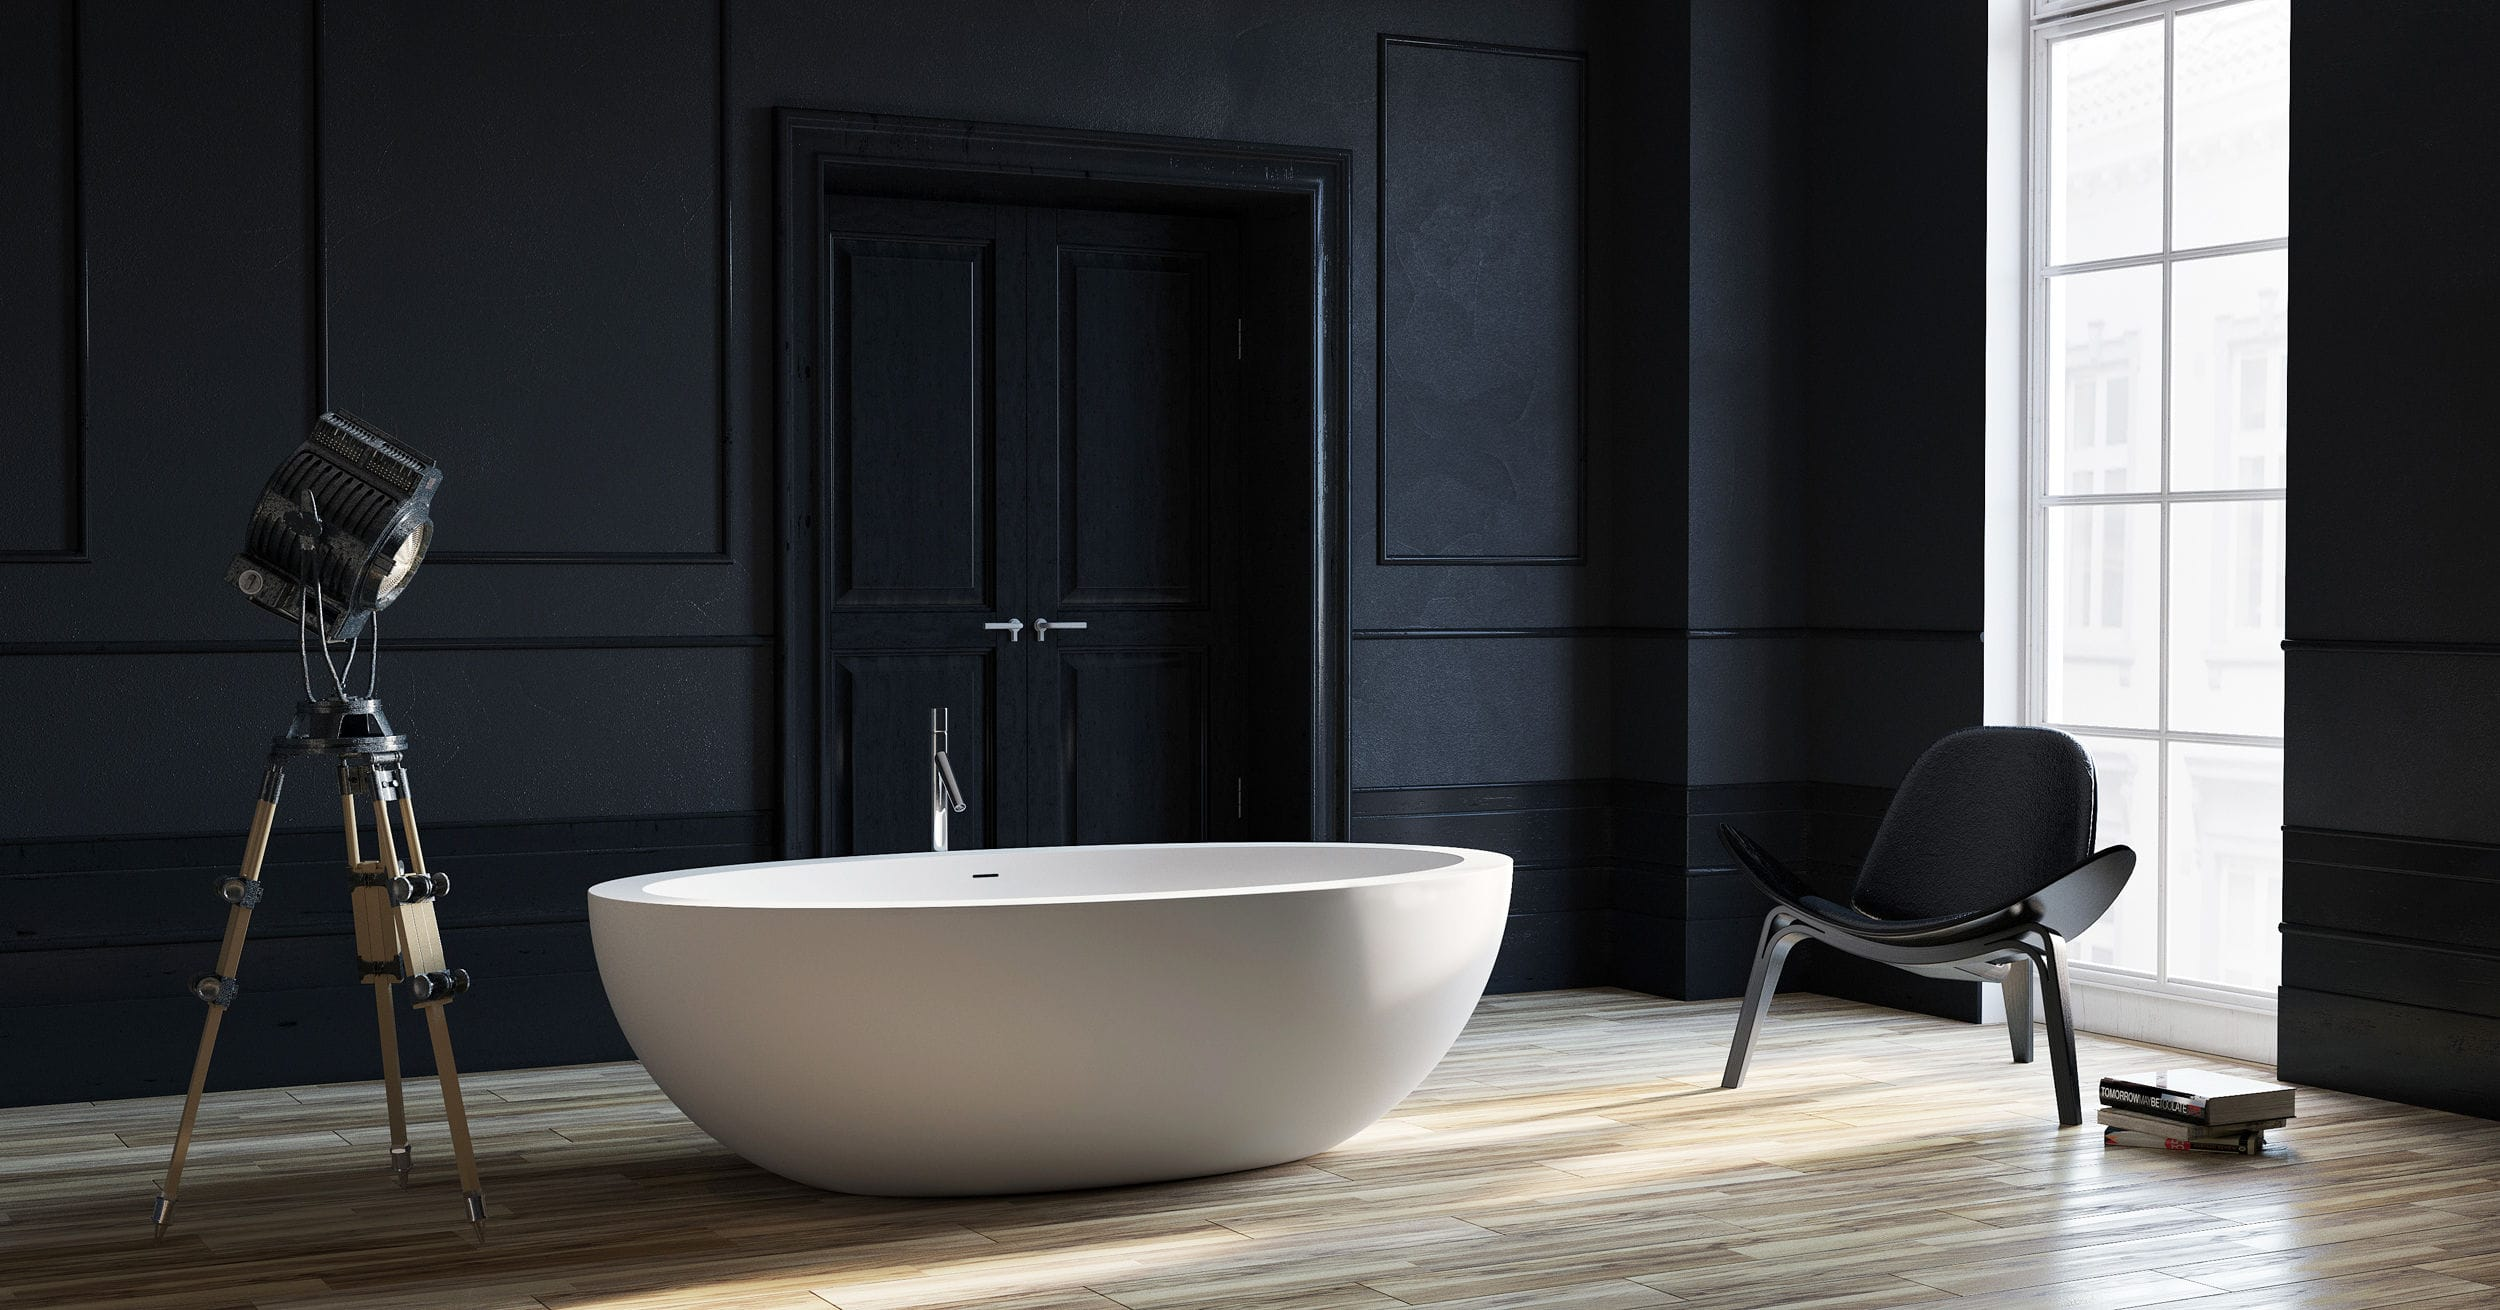 Vasca Da Bagno In Francese Traduci : Antico bagno francesi vasca zincata zinco baby vasca bagno etsy